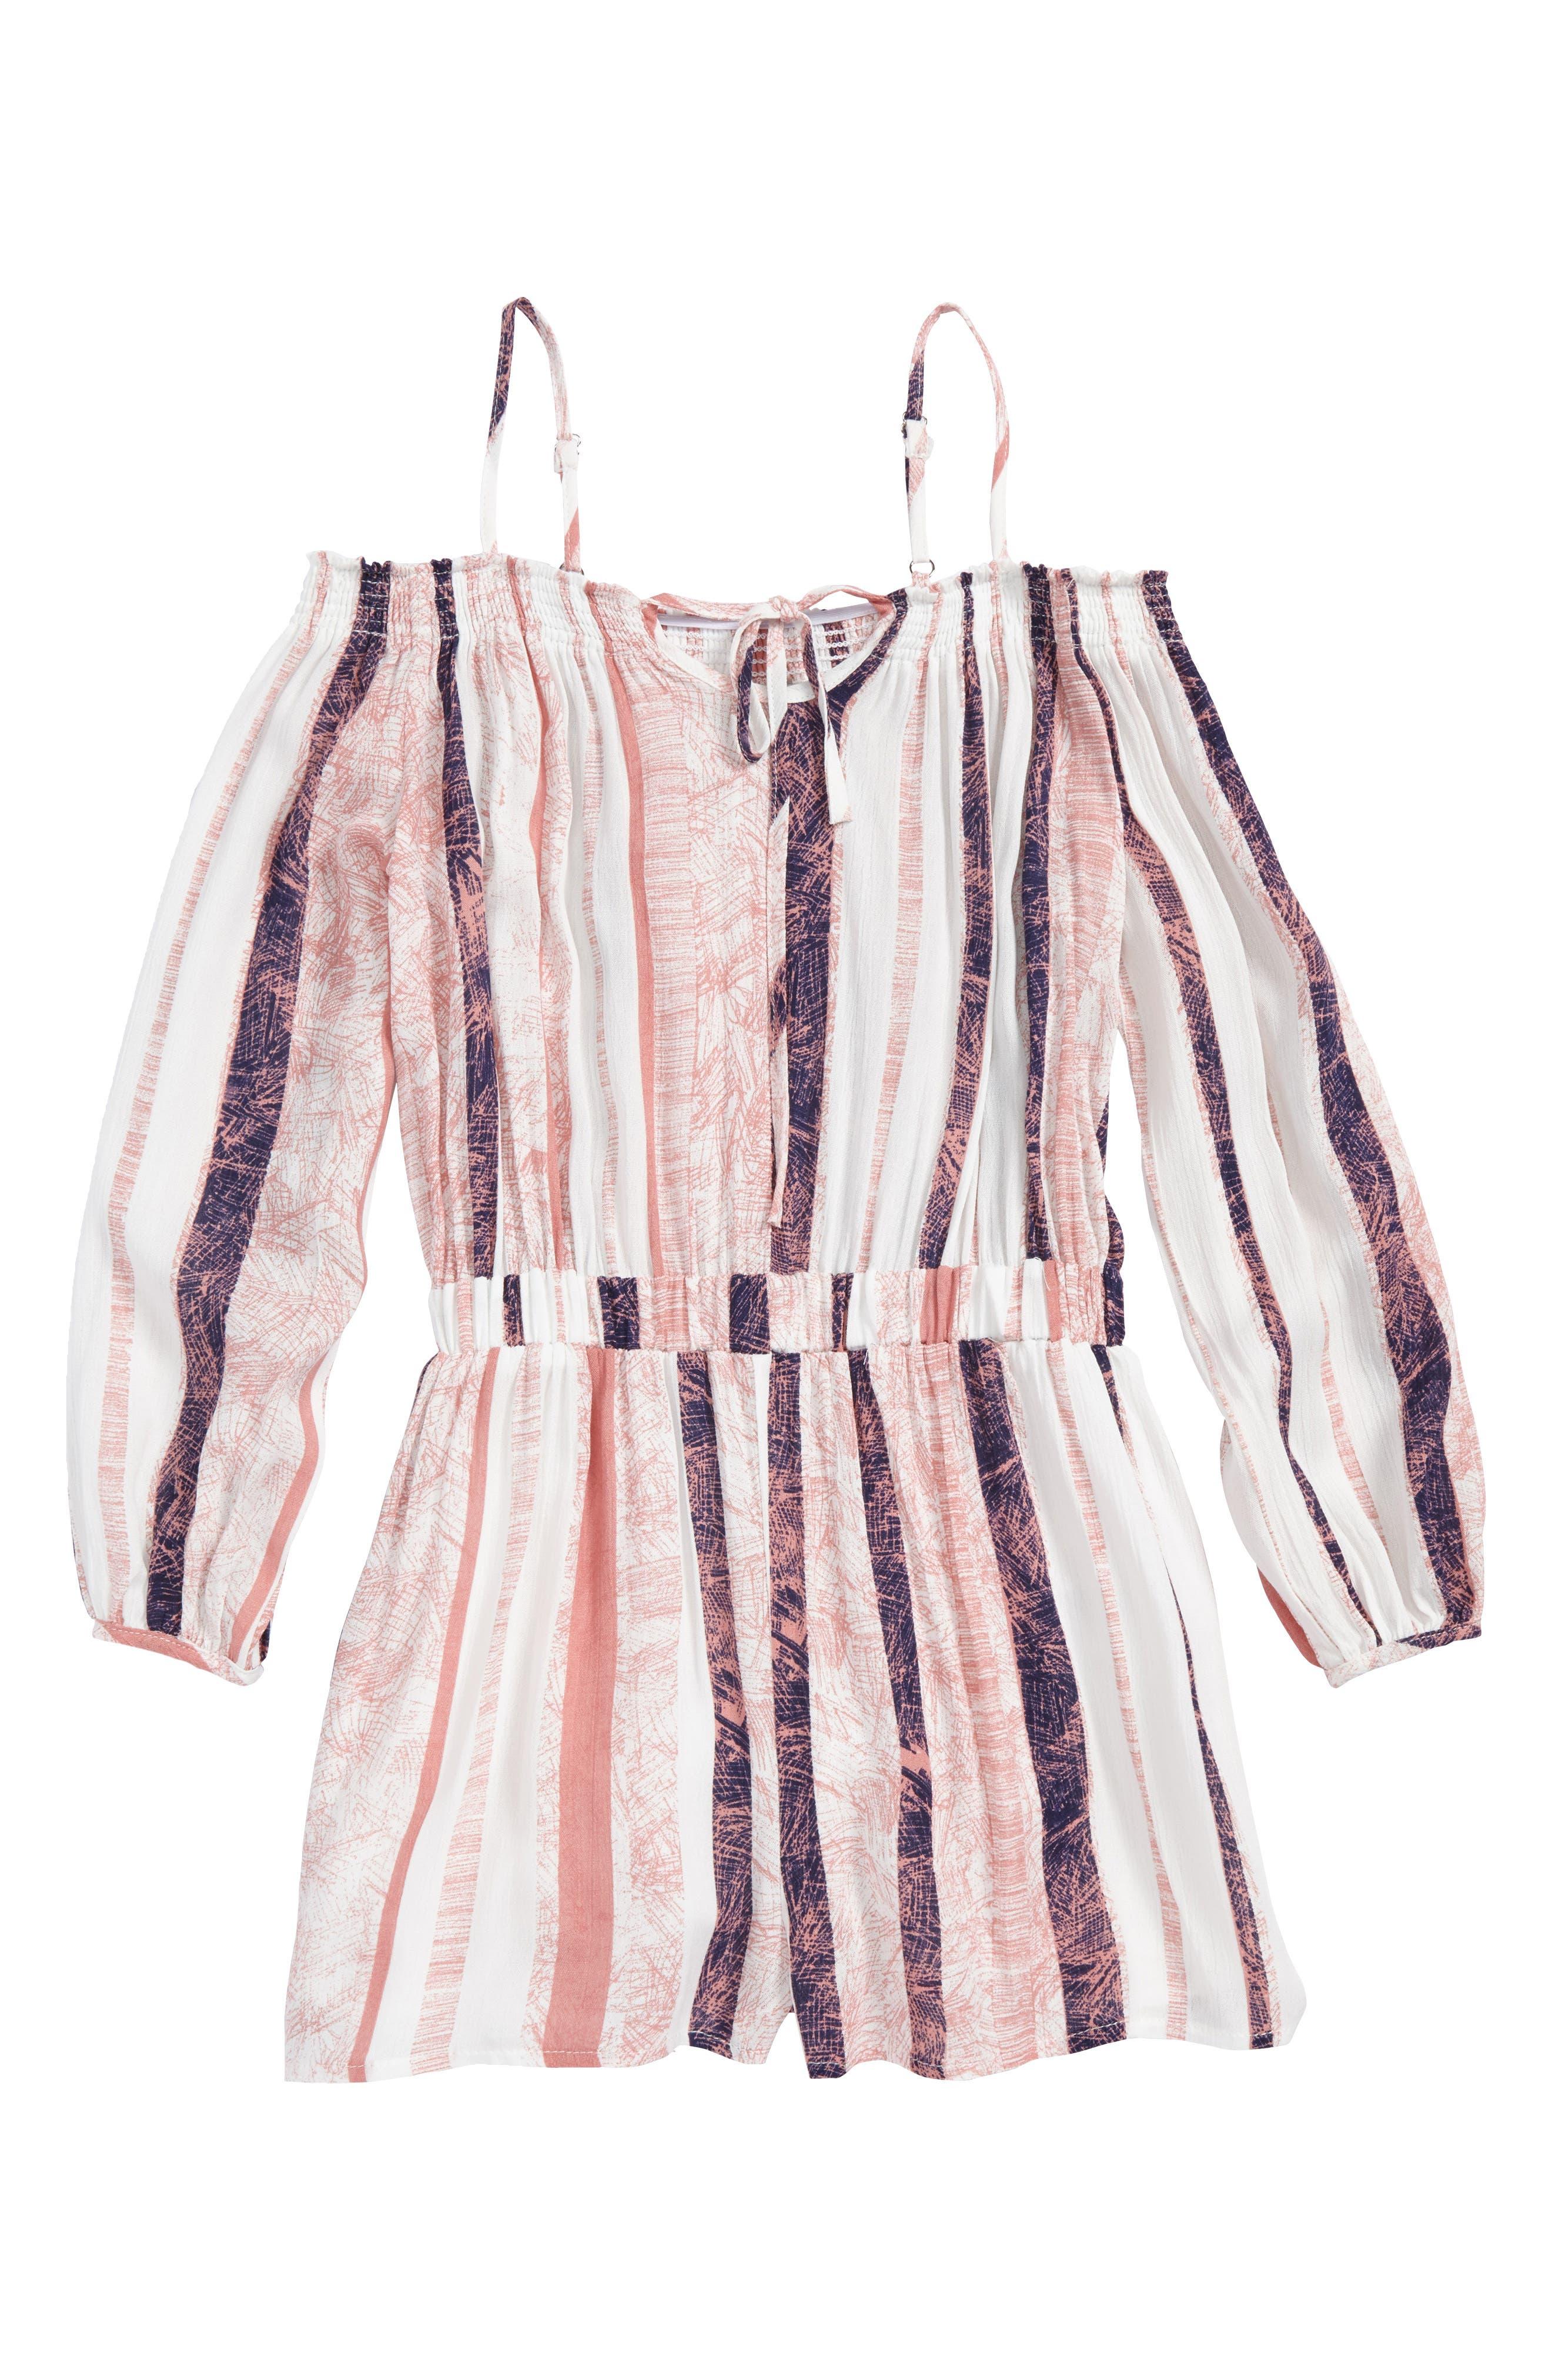 Stripe Off the Shoulder Romper,                             Main thumbnail 1, color,                             Pink Multi